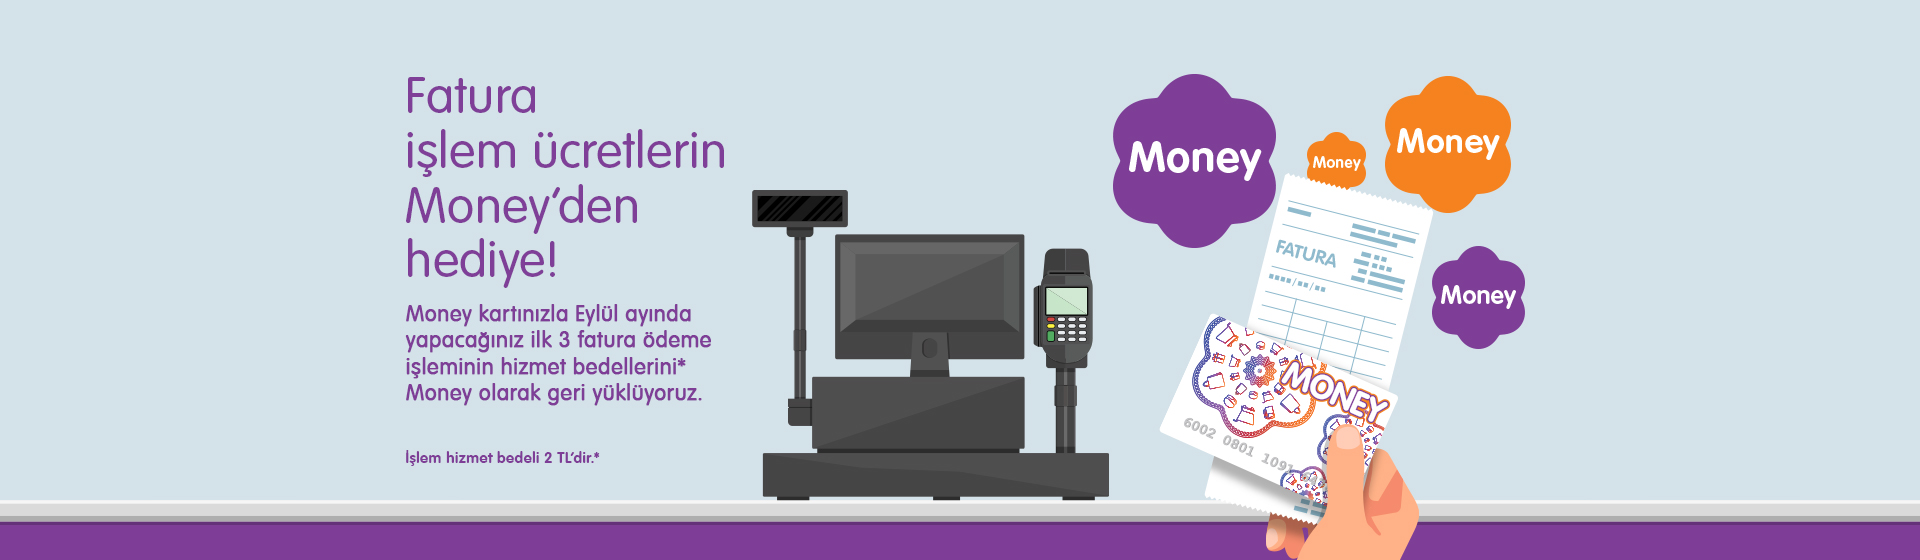 Money Fatura İşlemi Kampanyası